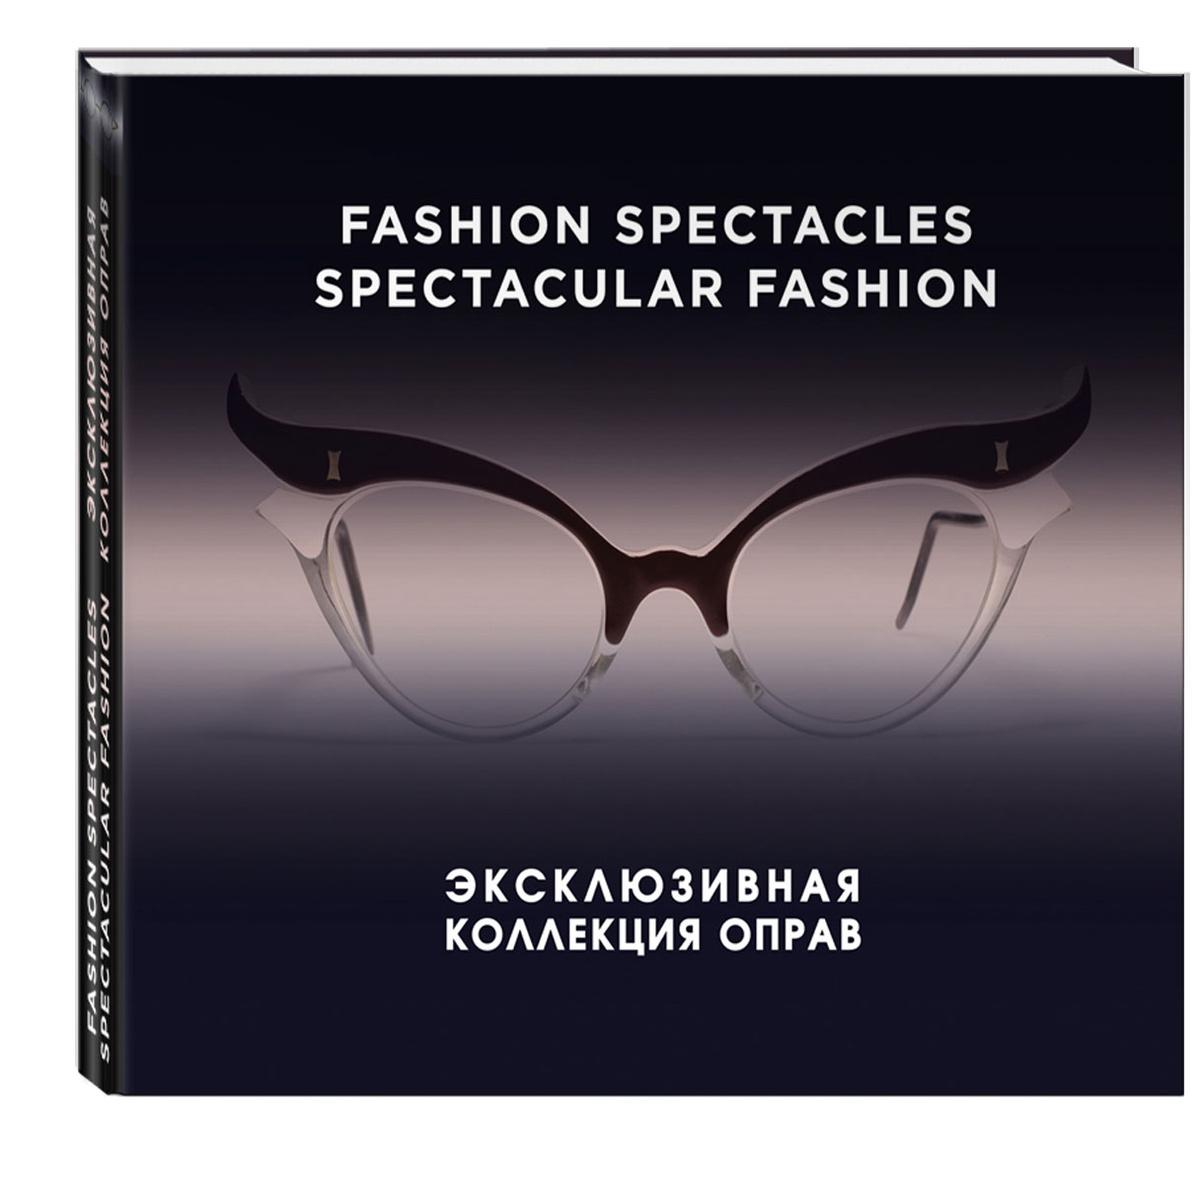 Fashion Spectacles, Spectacular Fashion. Эксклюзивная коллекция оправ #1